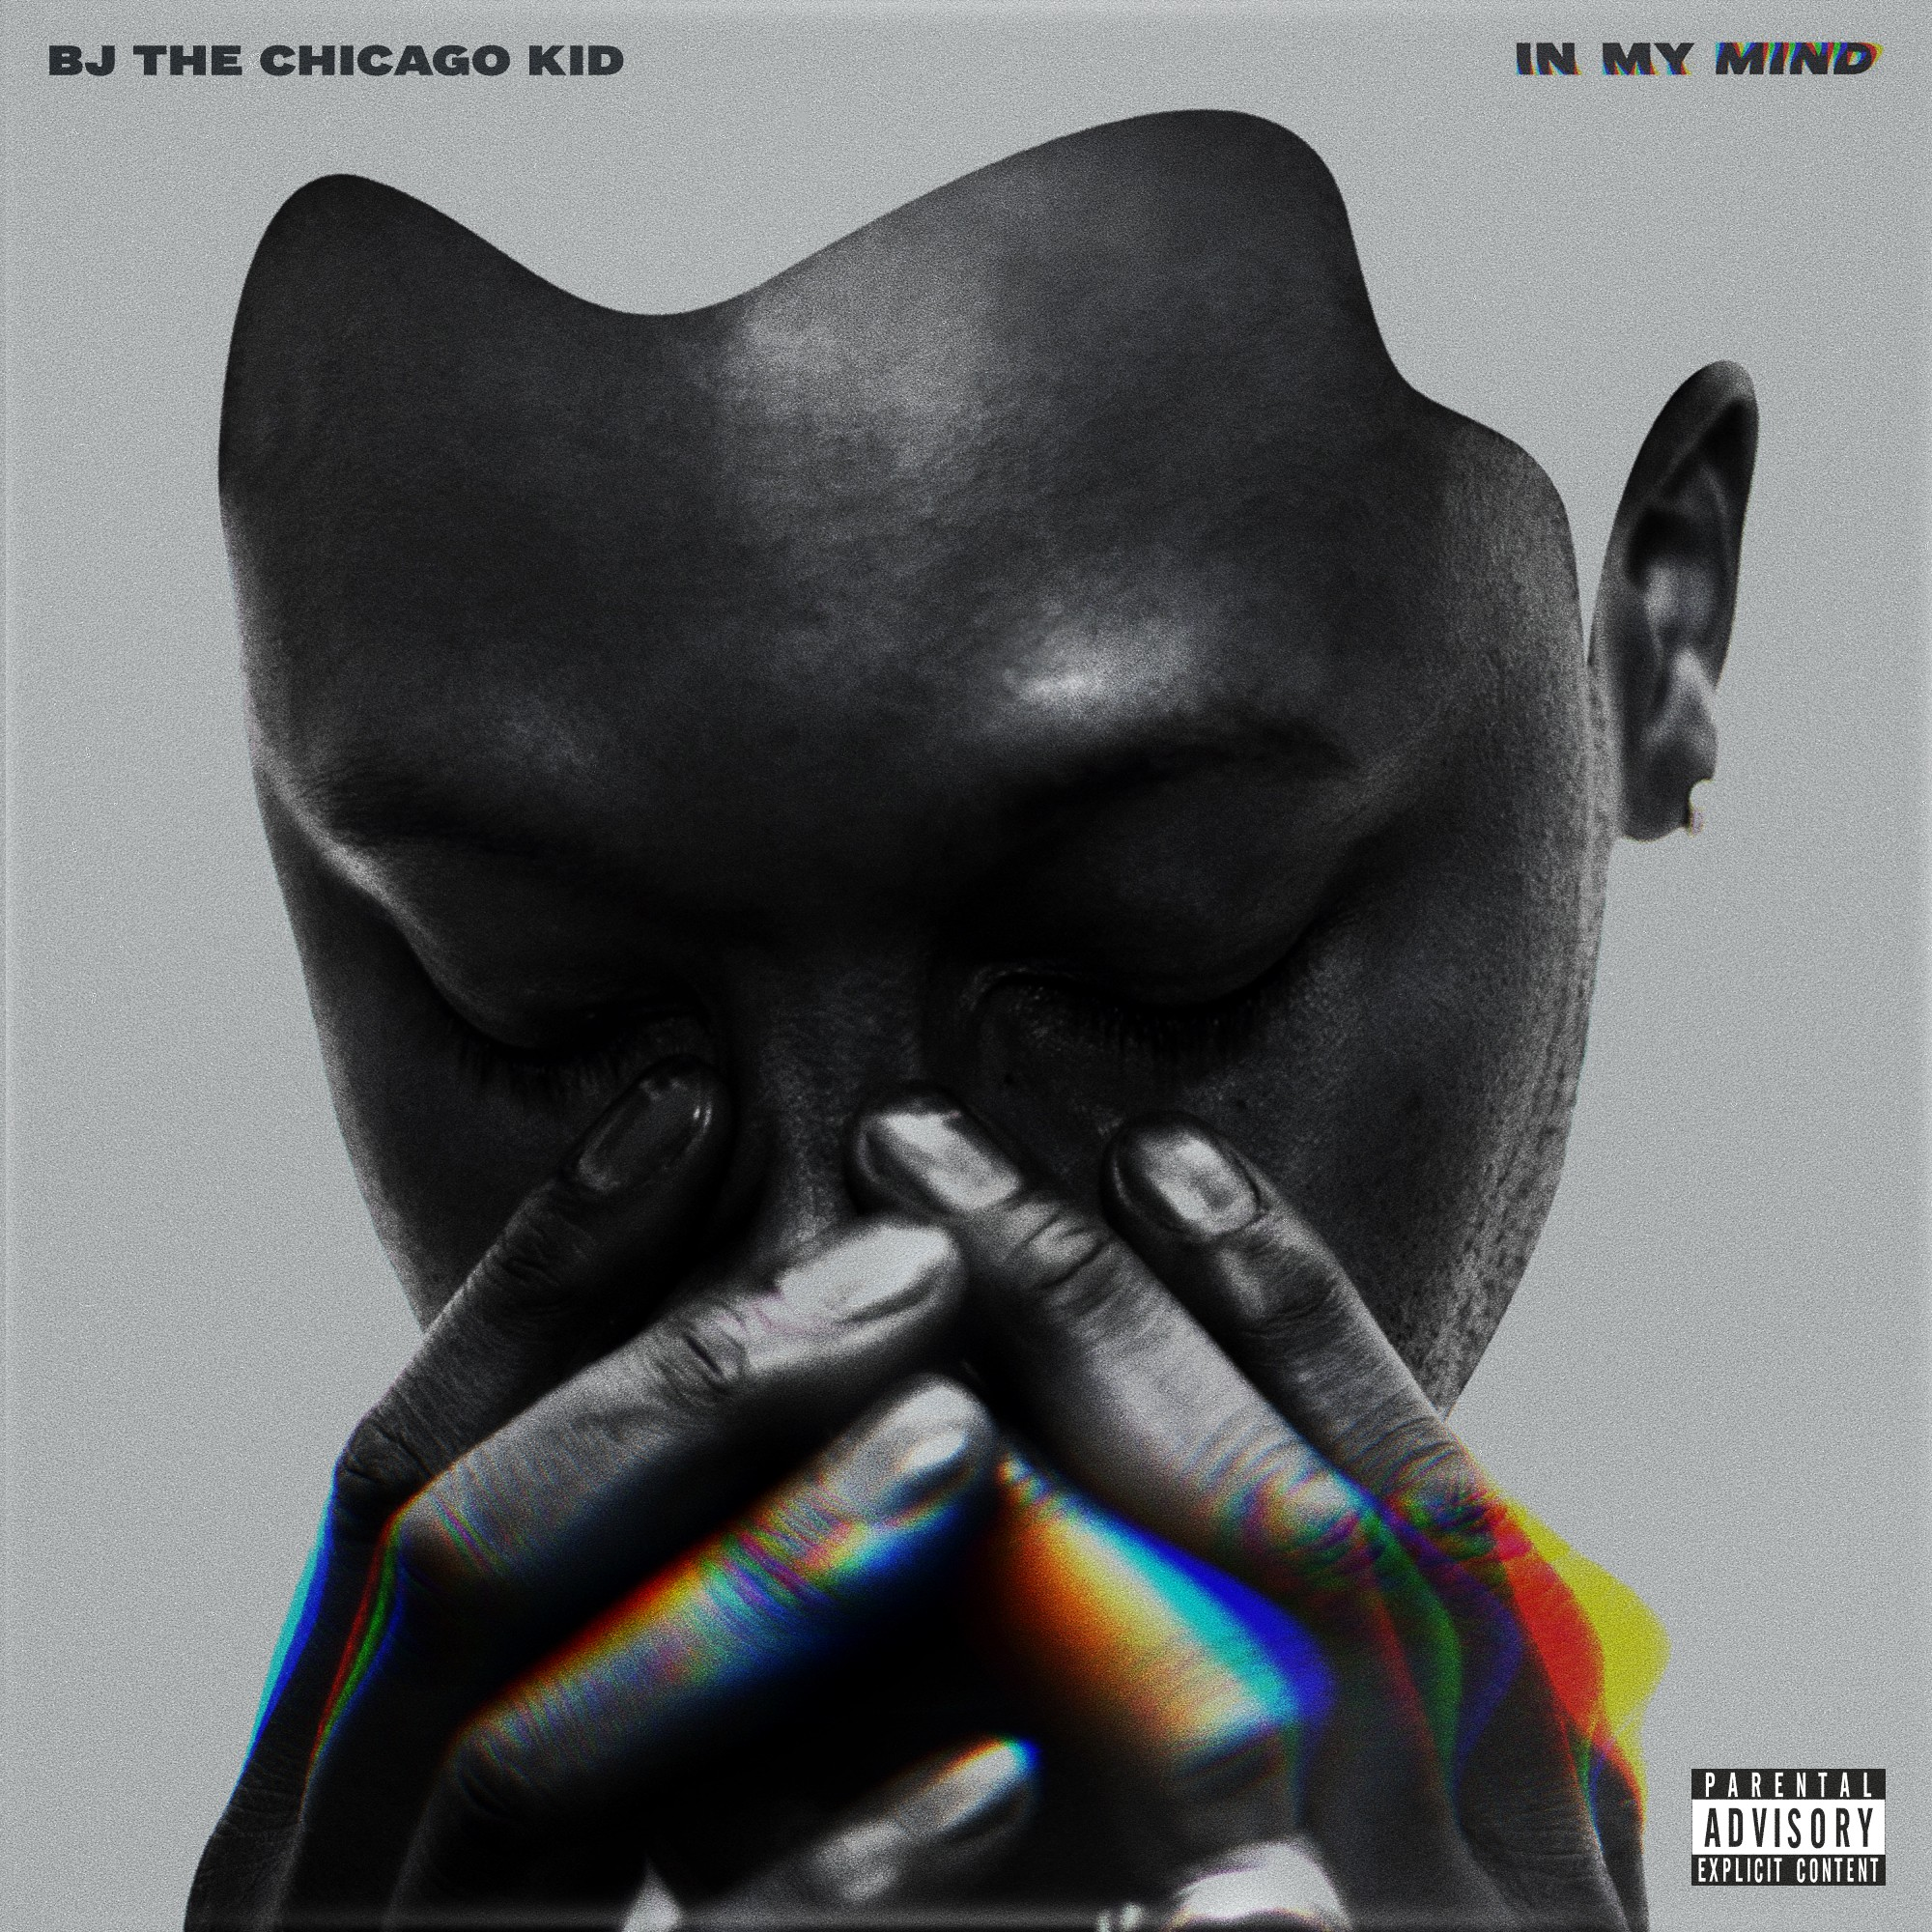 Bj the chicago kid - In my mind [Explicit Lyrics] (CD)